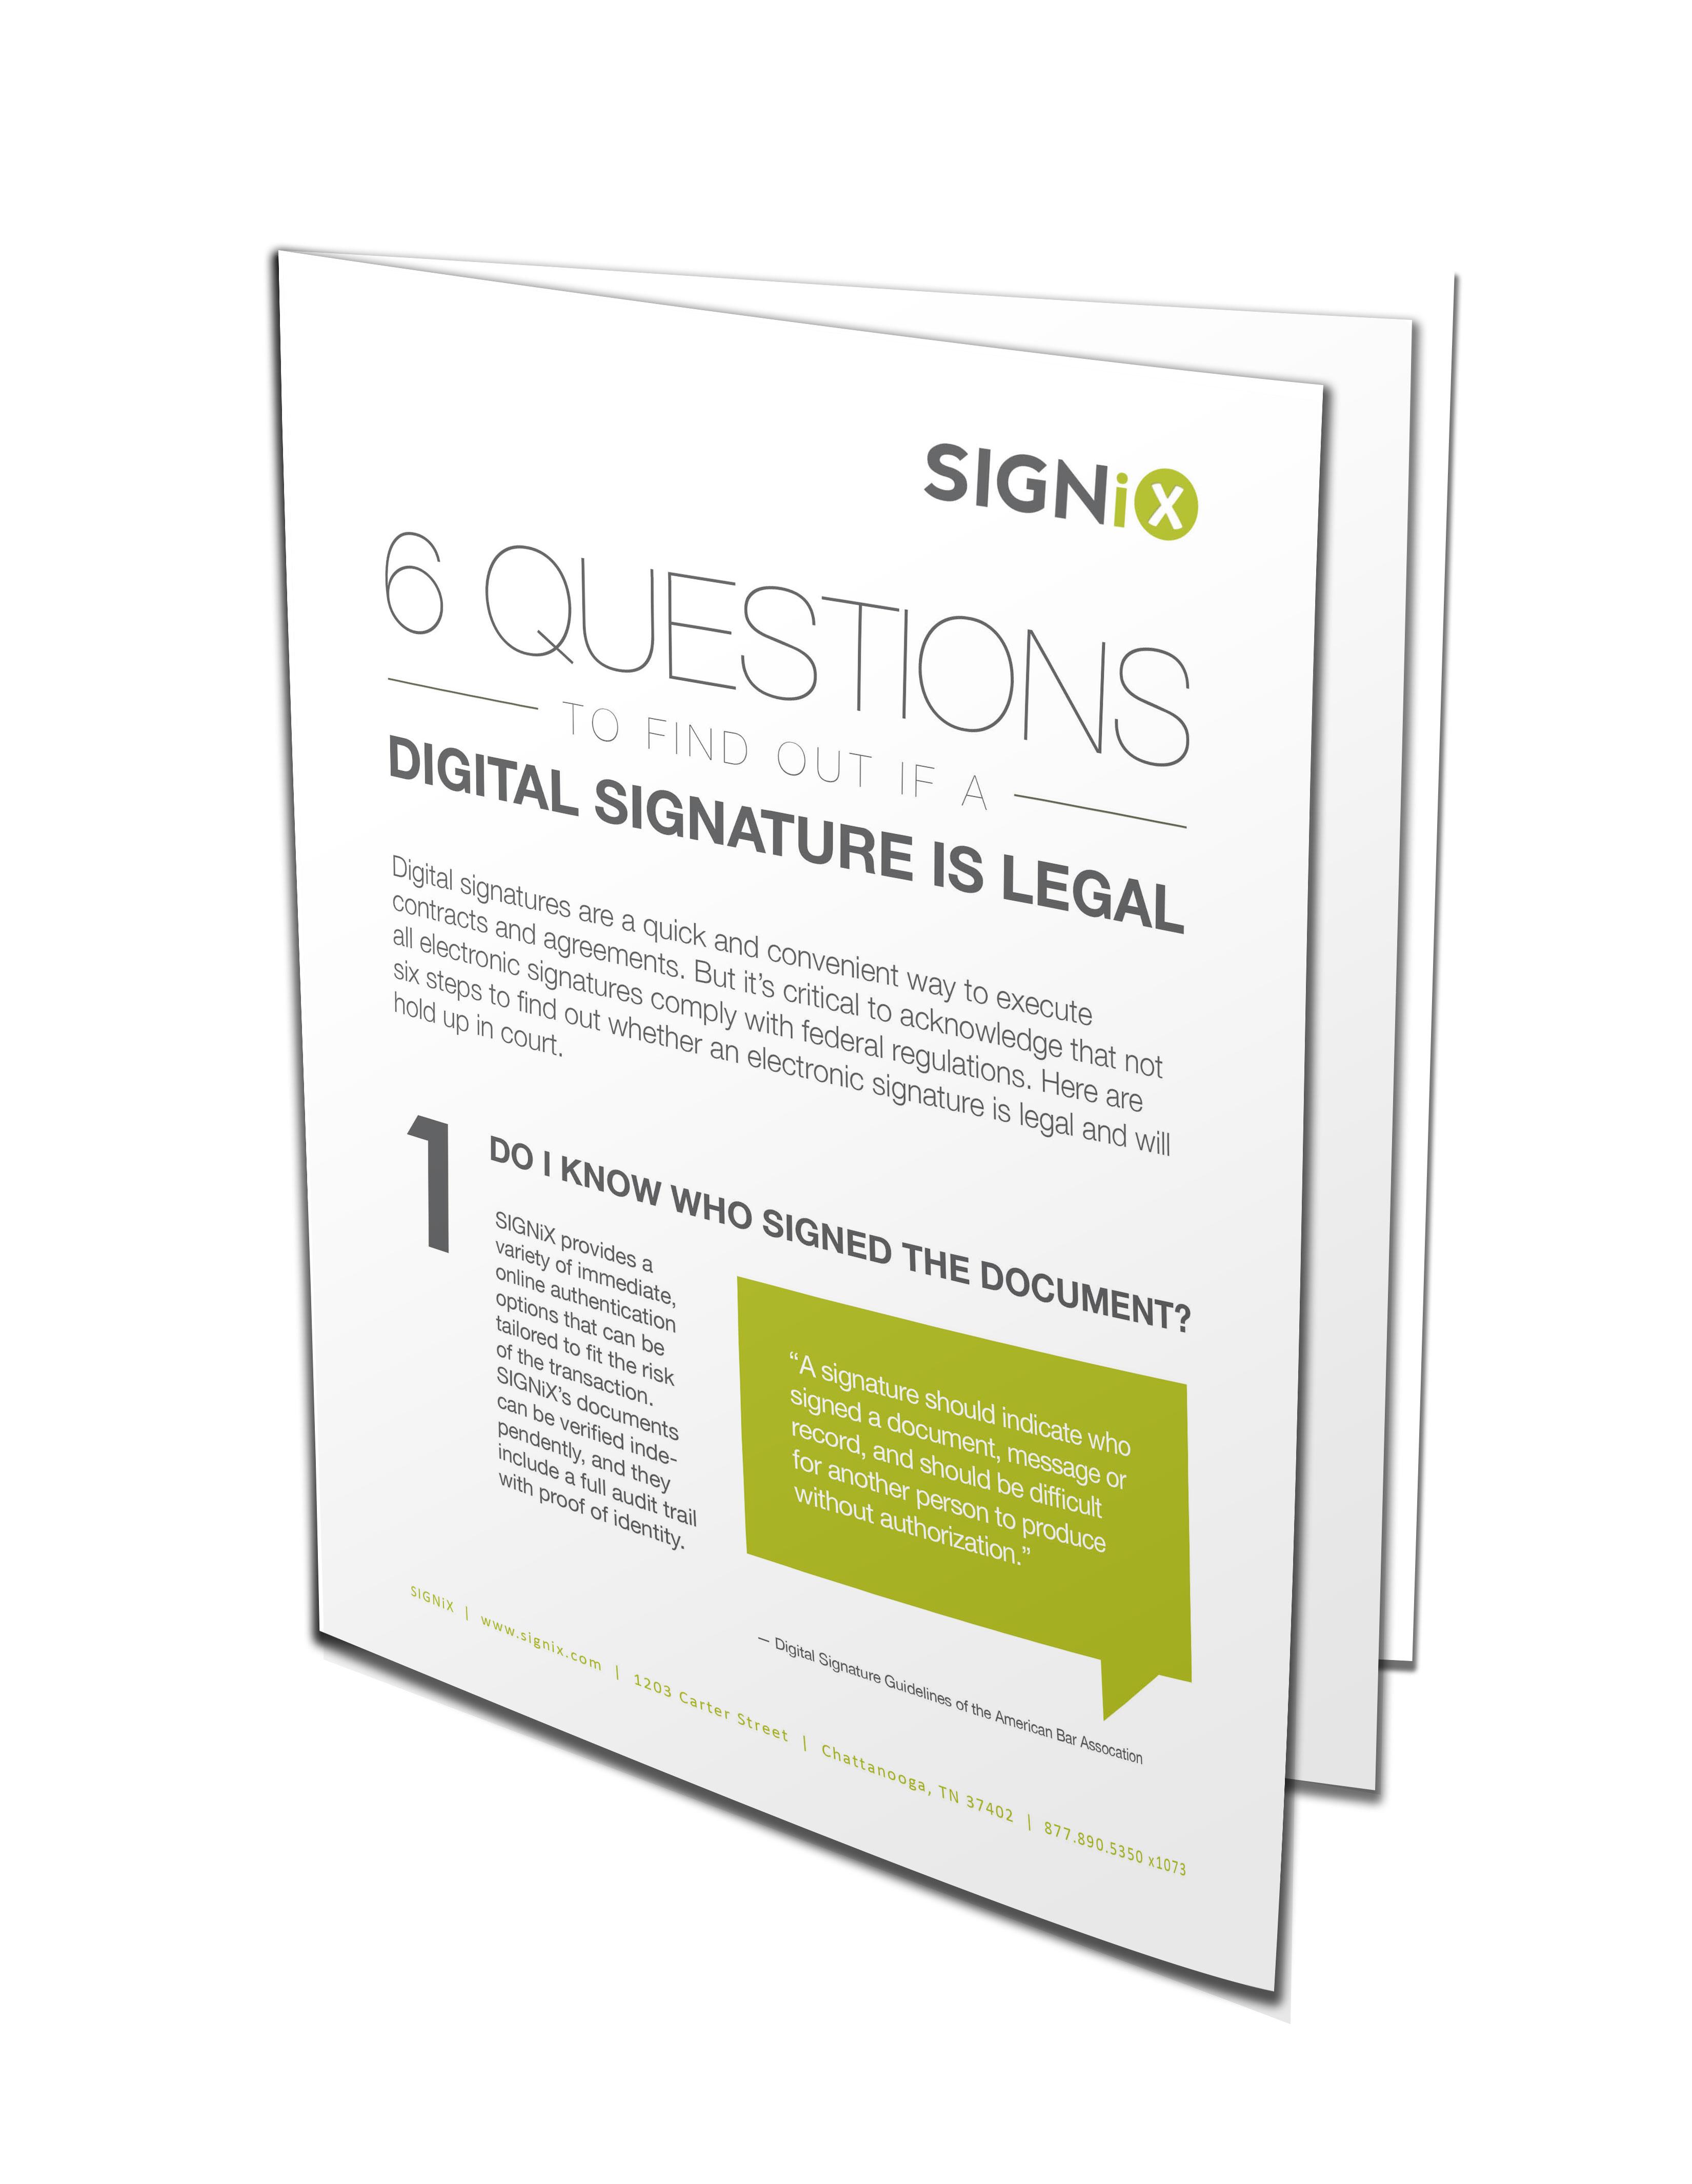 what makes a digital signature legal